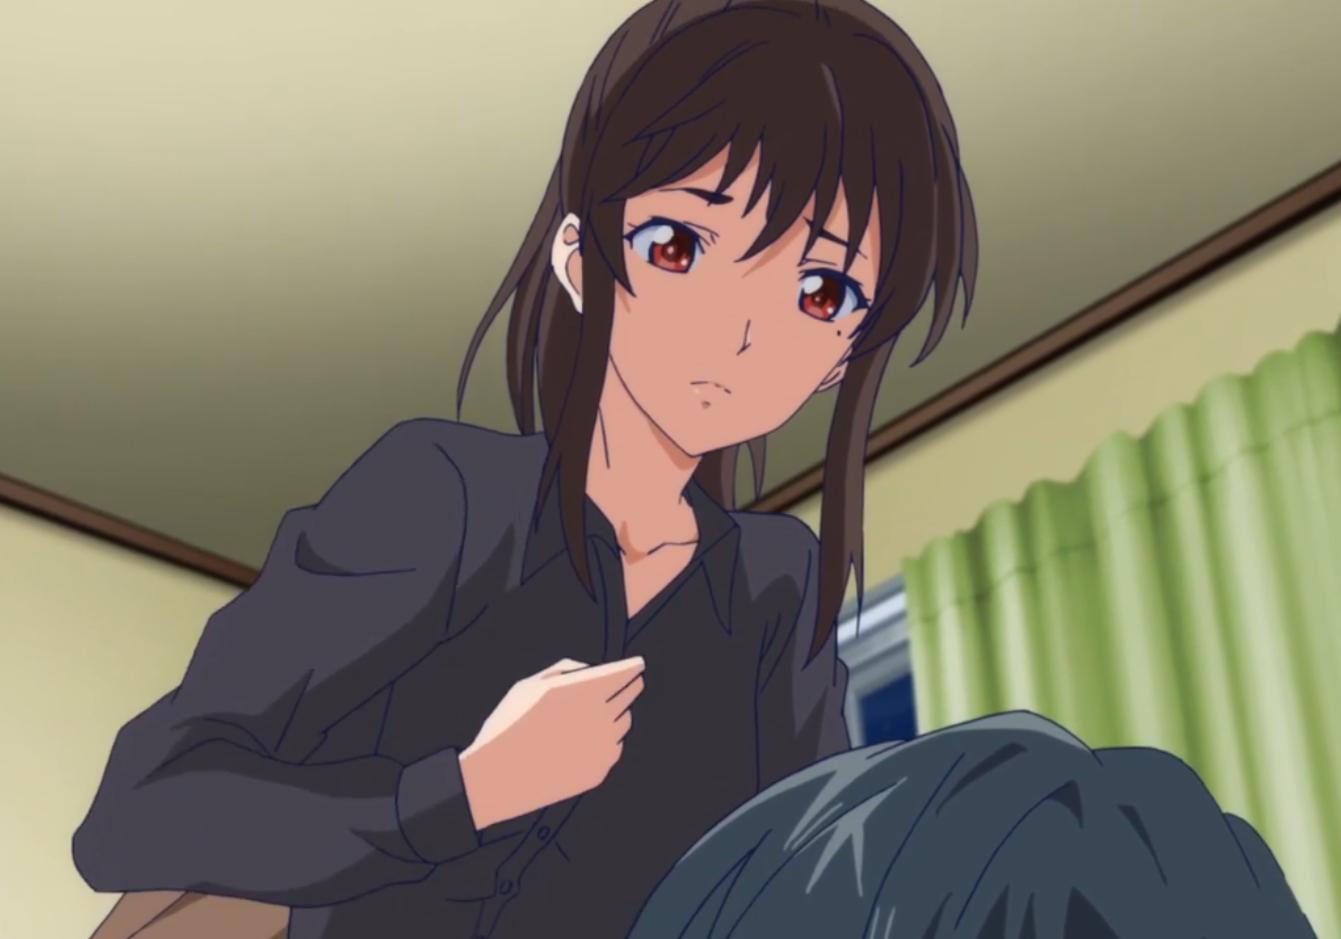 Pin de Freigeist en Fuuka (Anime/Manga)